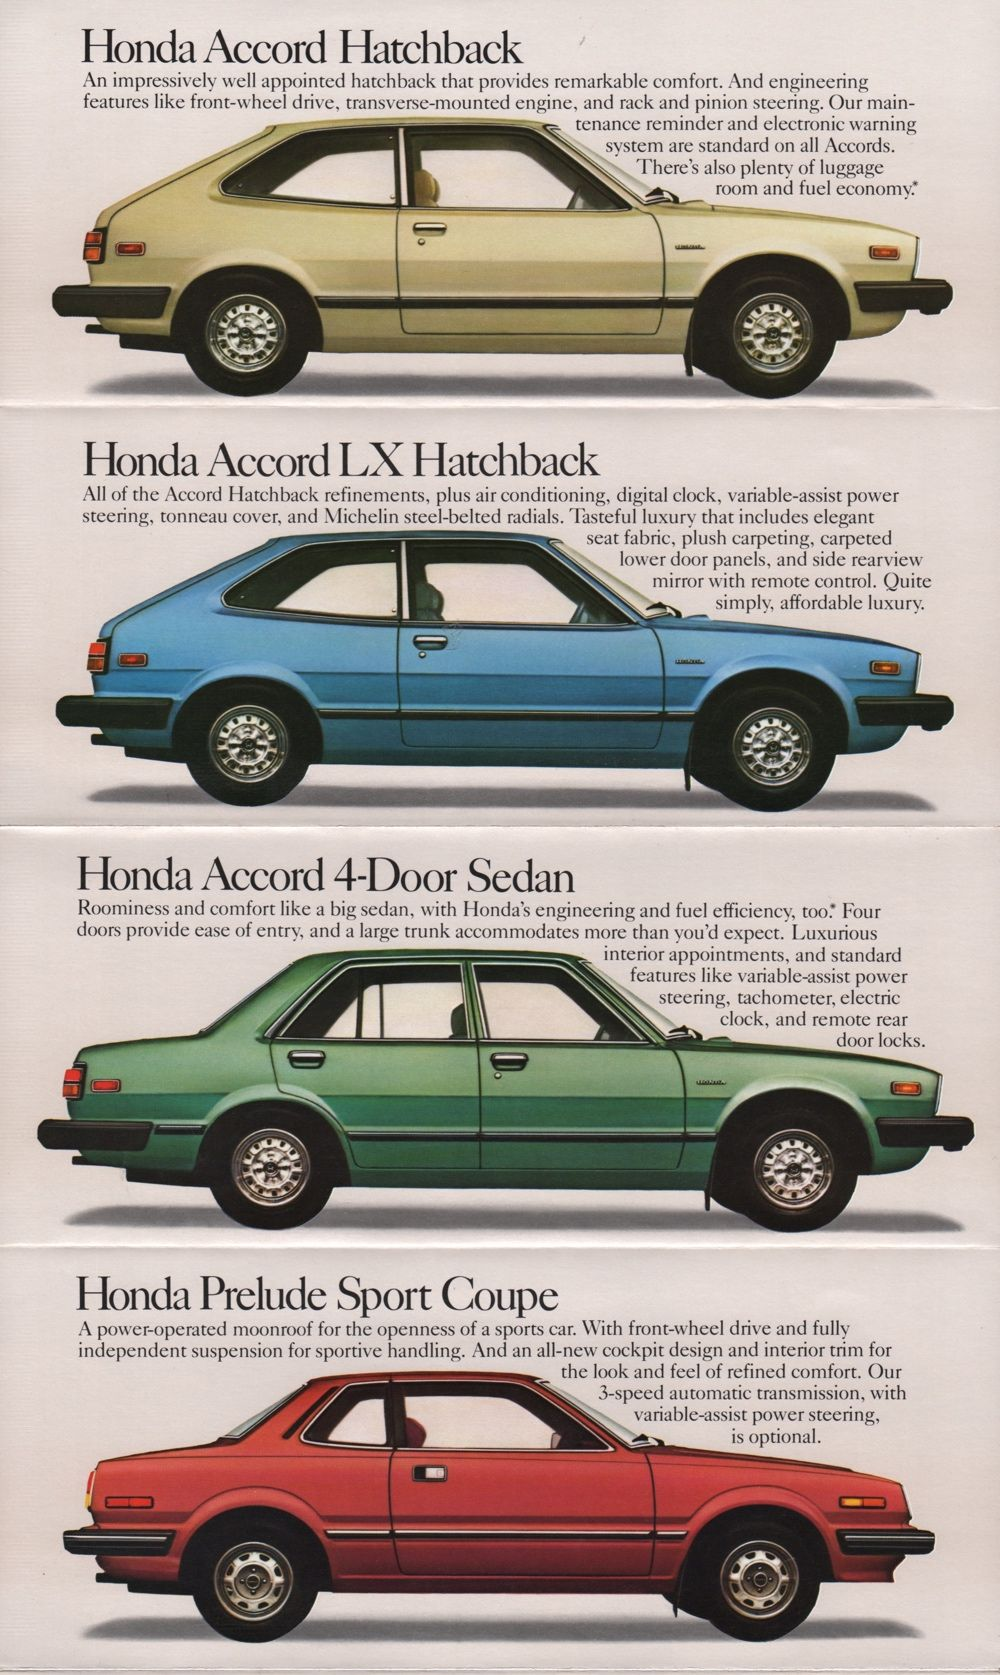 1981 Honda Sales Brochure Vintage Japanese Autos Pinterest Corvette Door Lock Controls Parts Accessories For Cars Bikes Motors